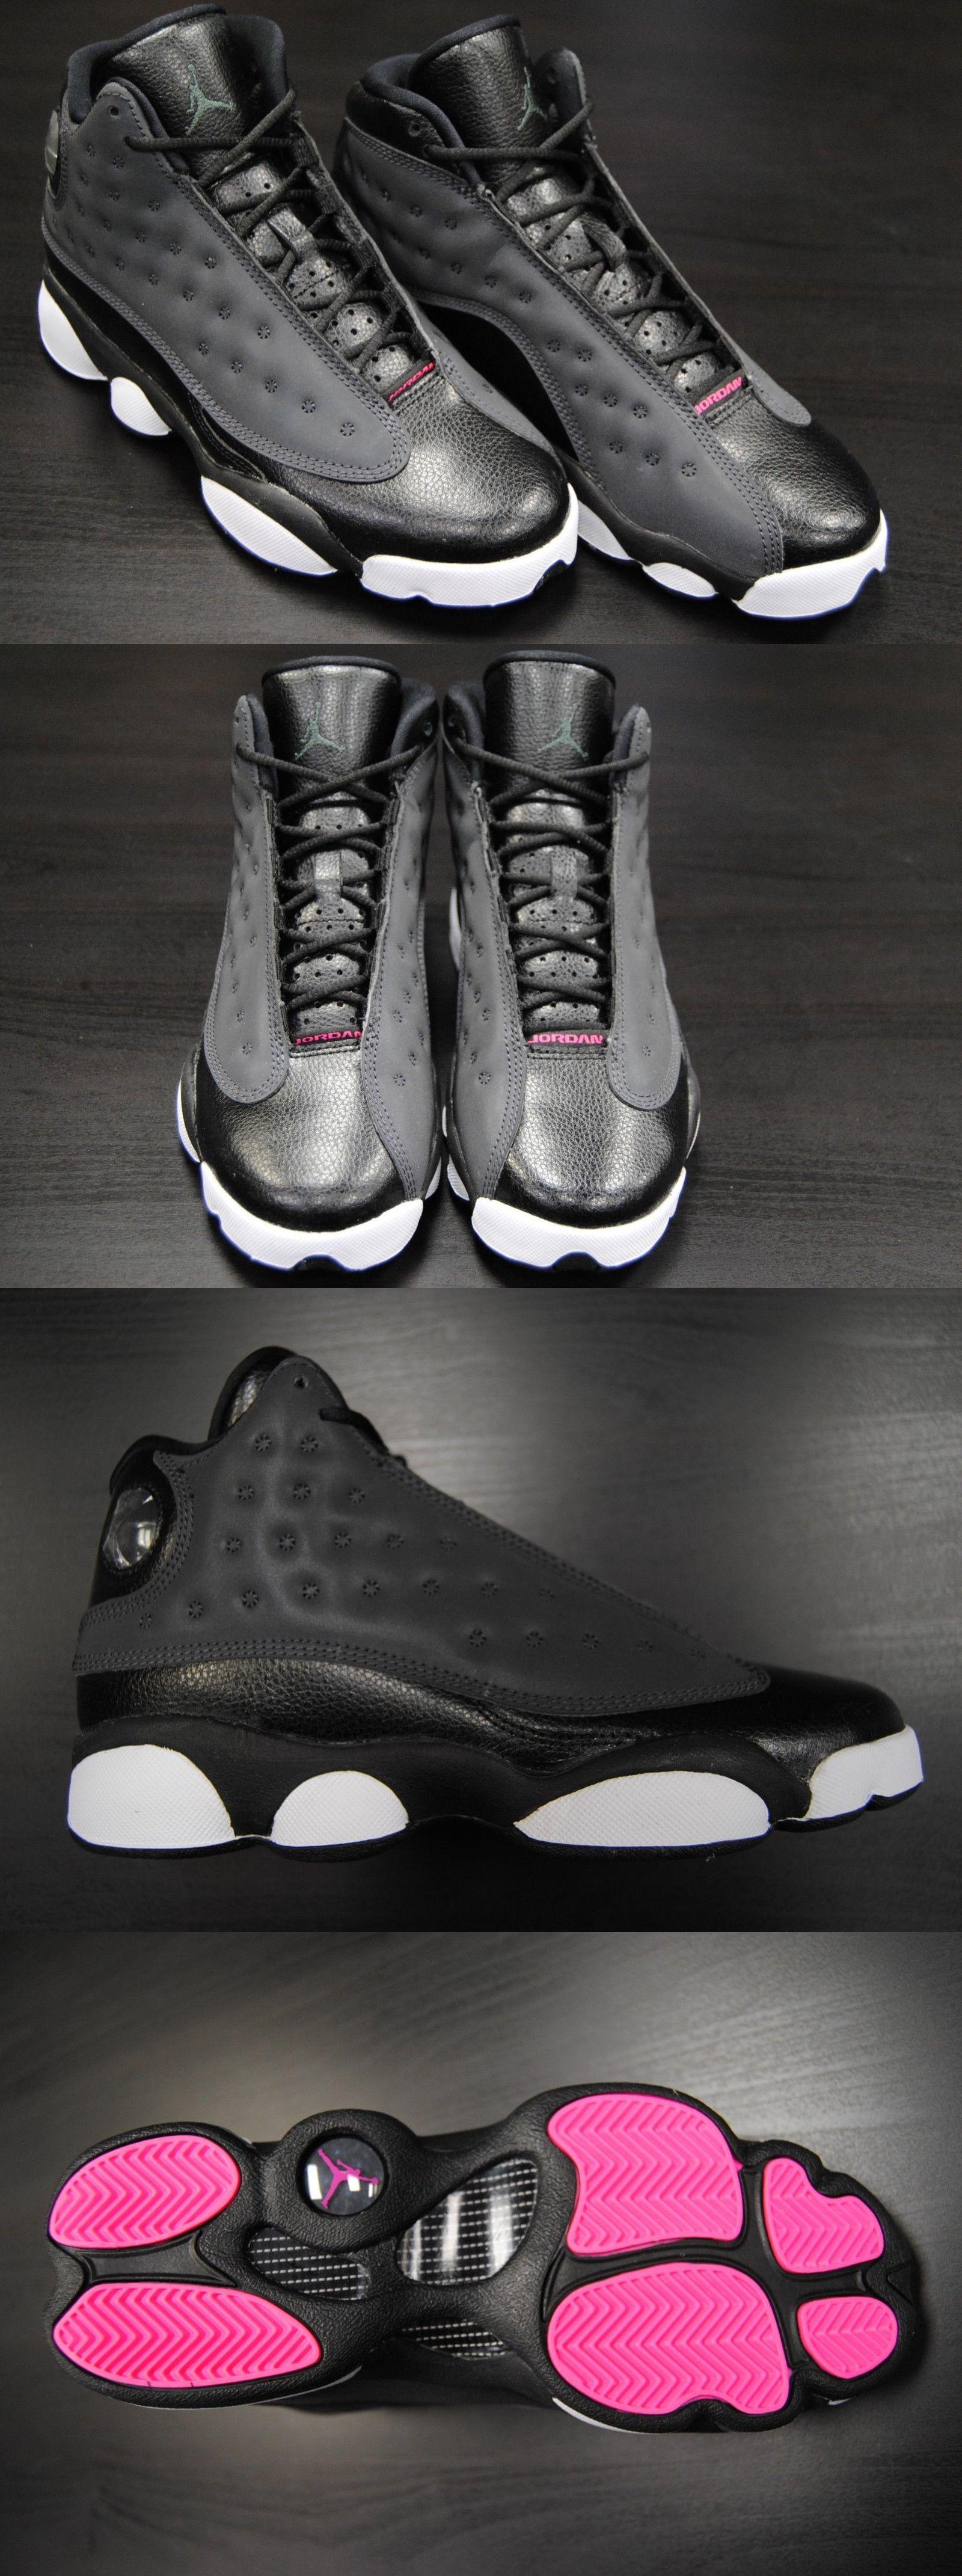 unisex shoes 155202 439358 009 new kid s air jordan retro 13 gg